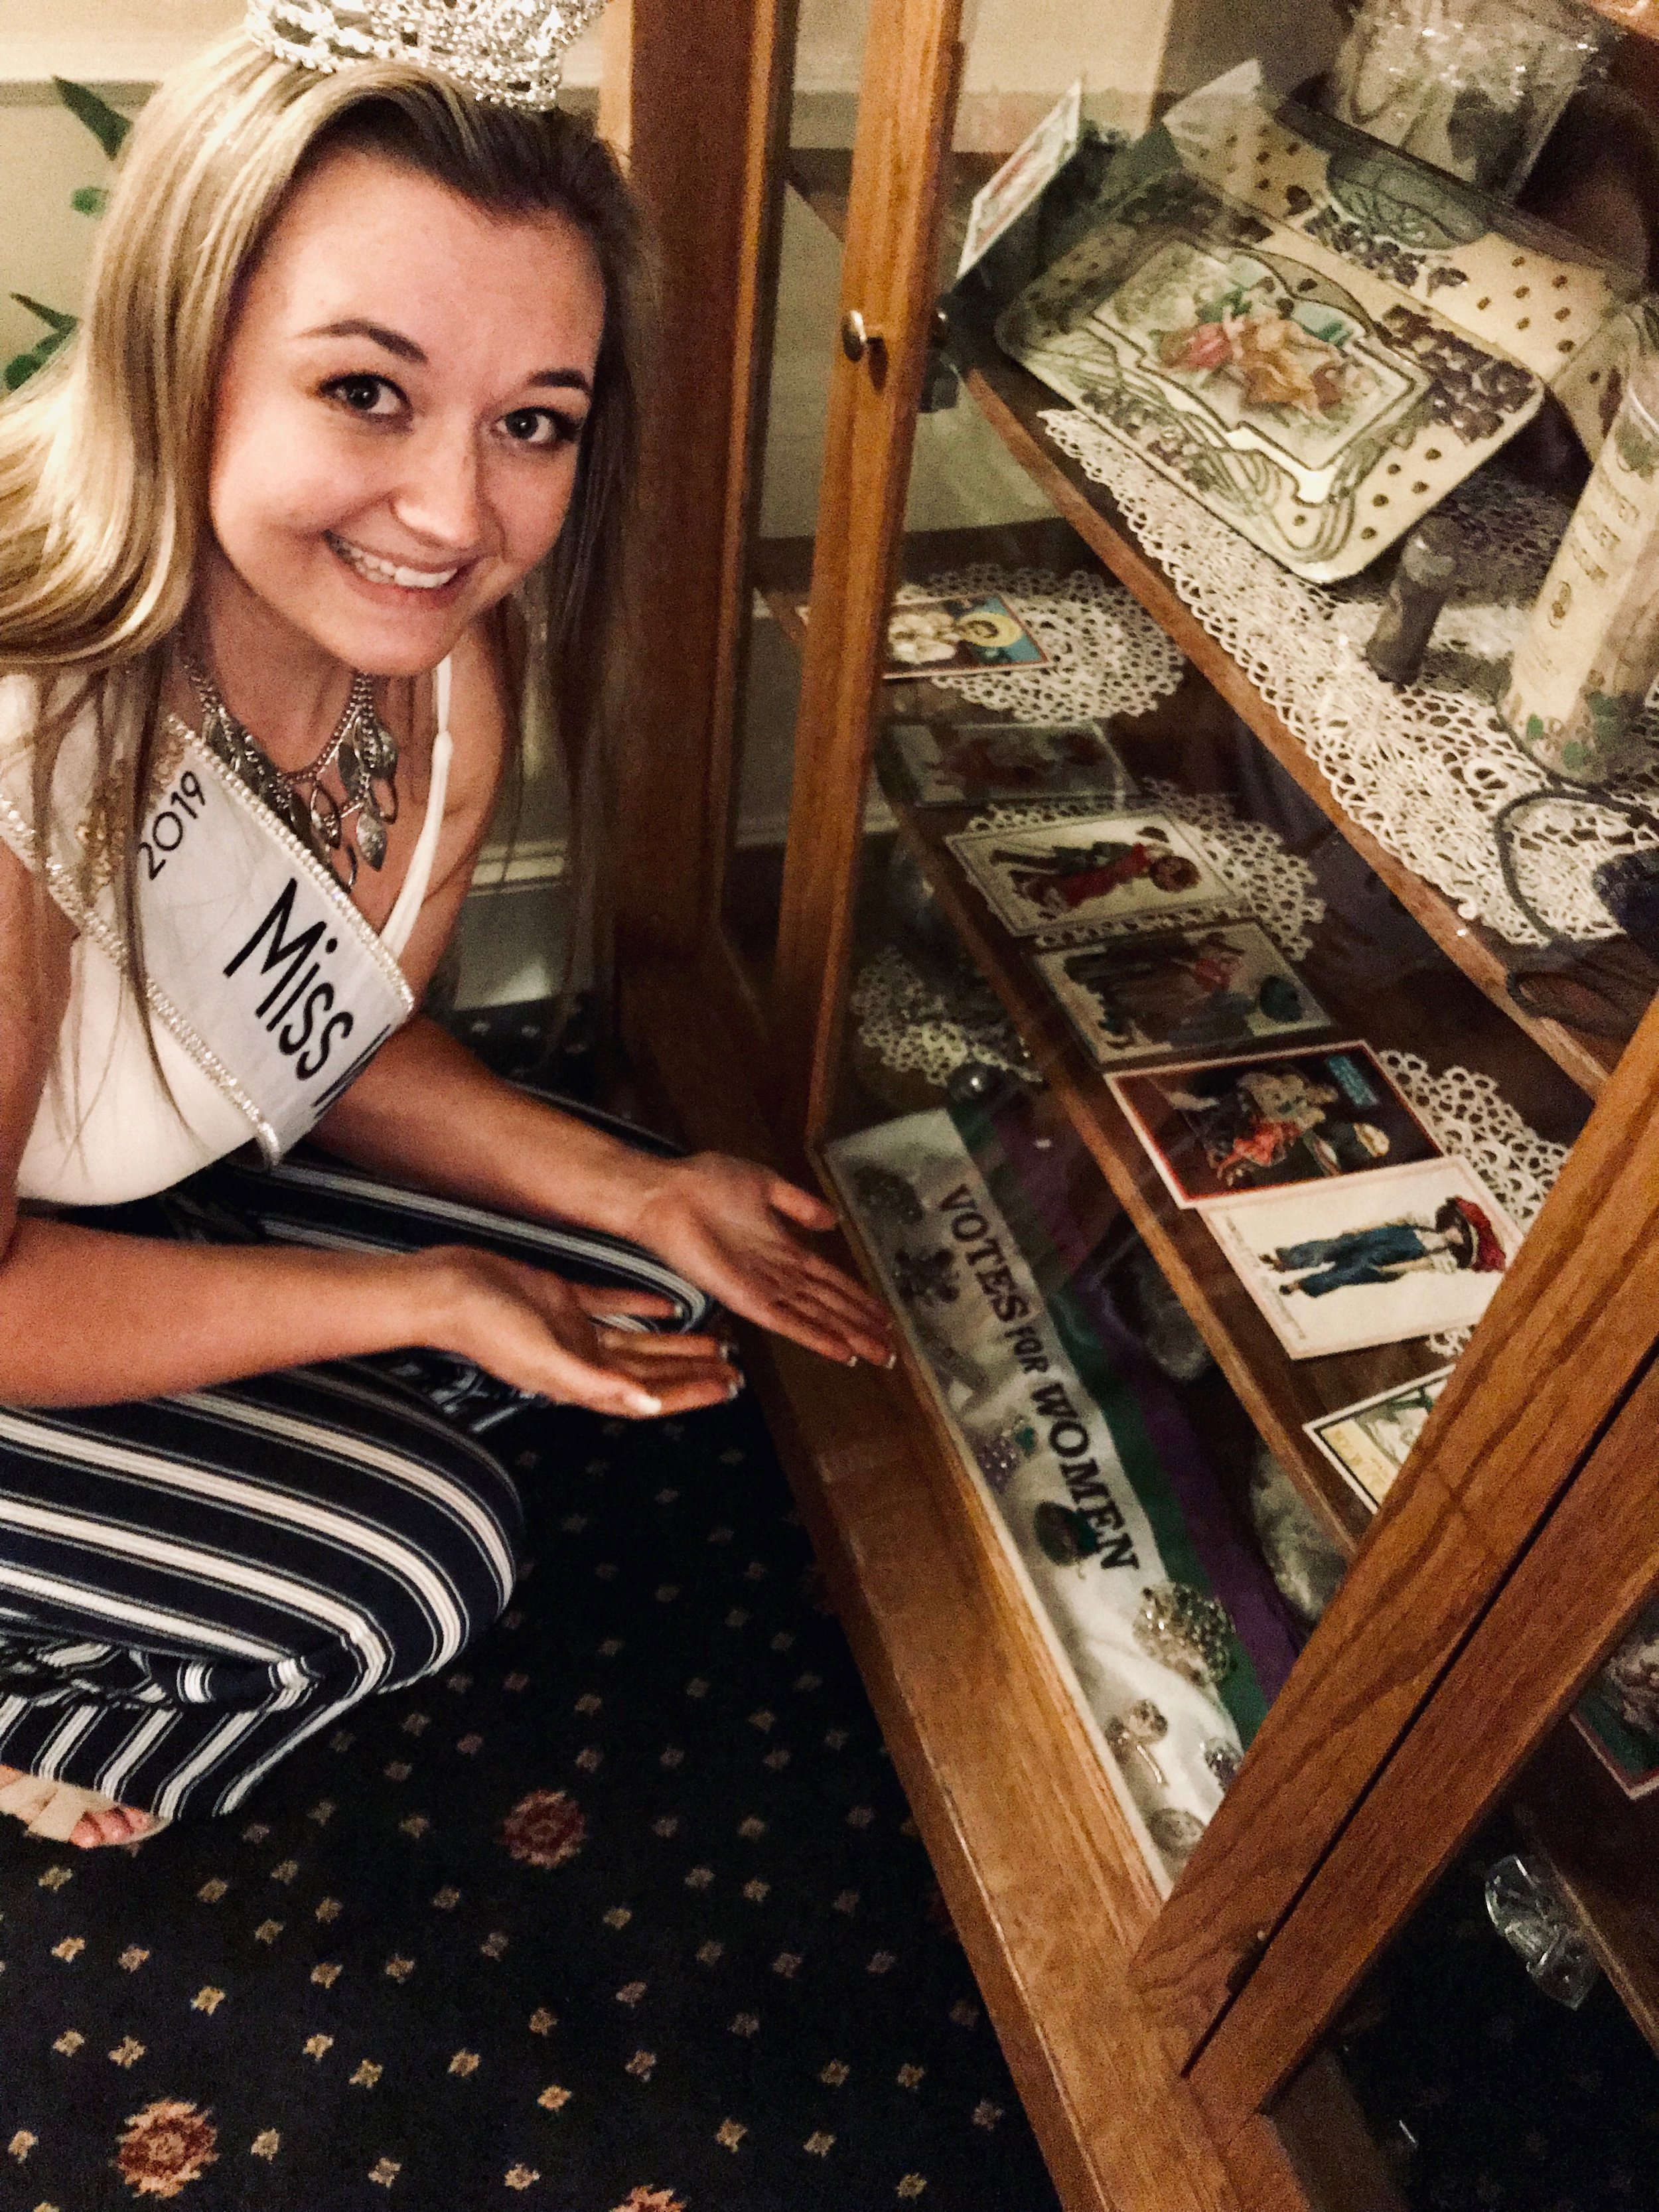 Jordan showing memorabilia of the women's suffrage in Cheyenne, Wyoming.